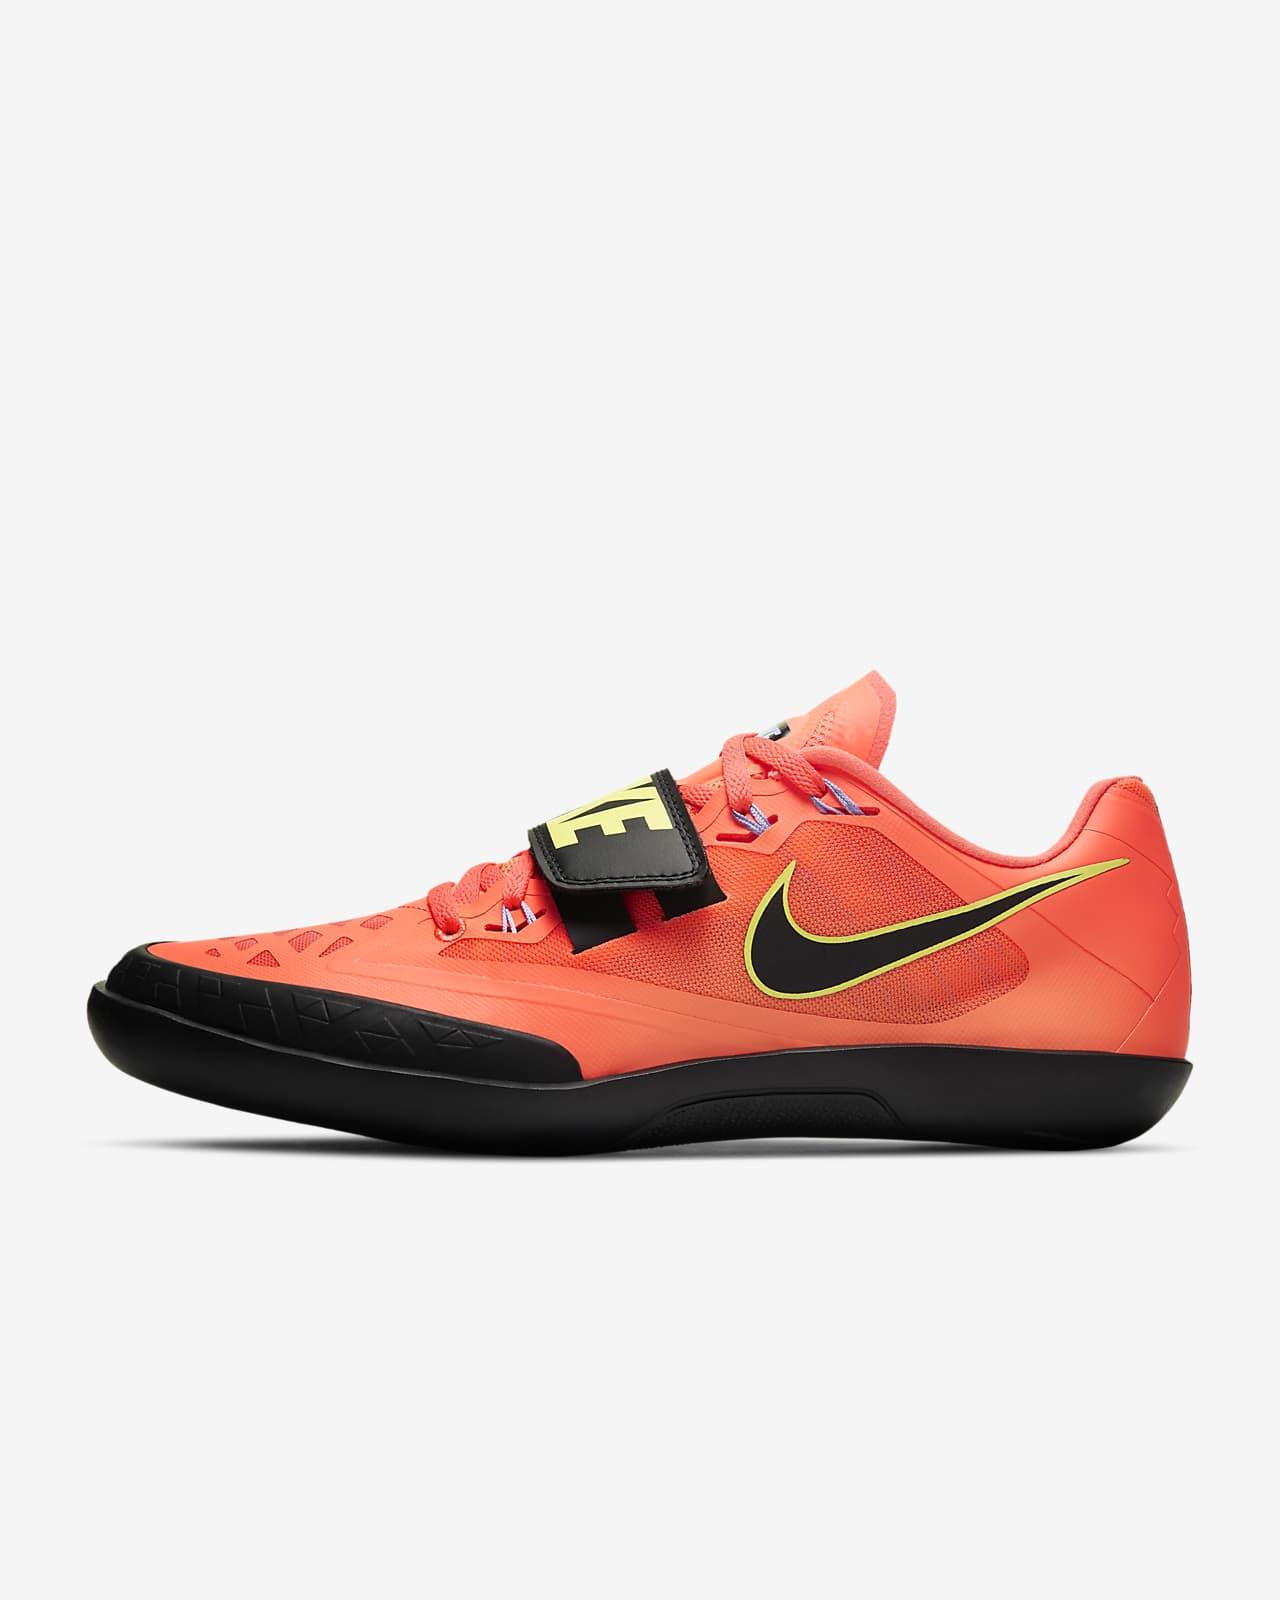 Nike Zoom SD 4 Unisex Throwing Shoe